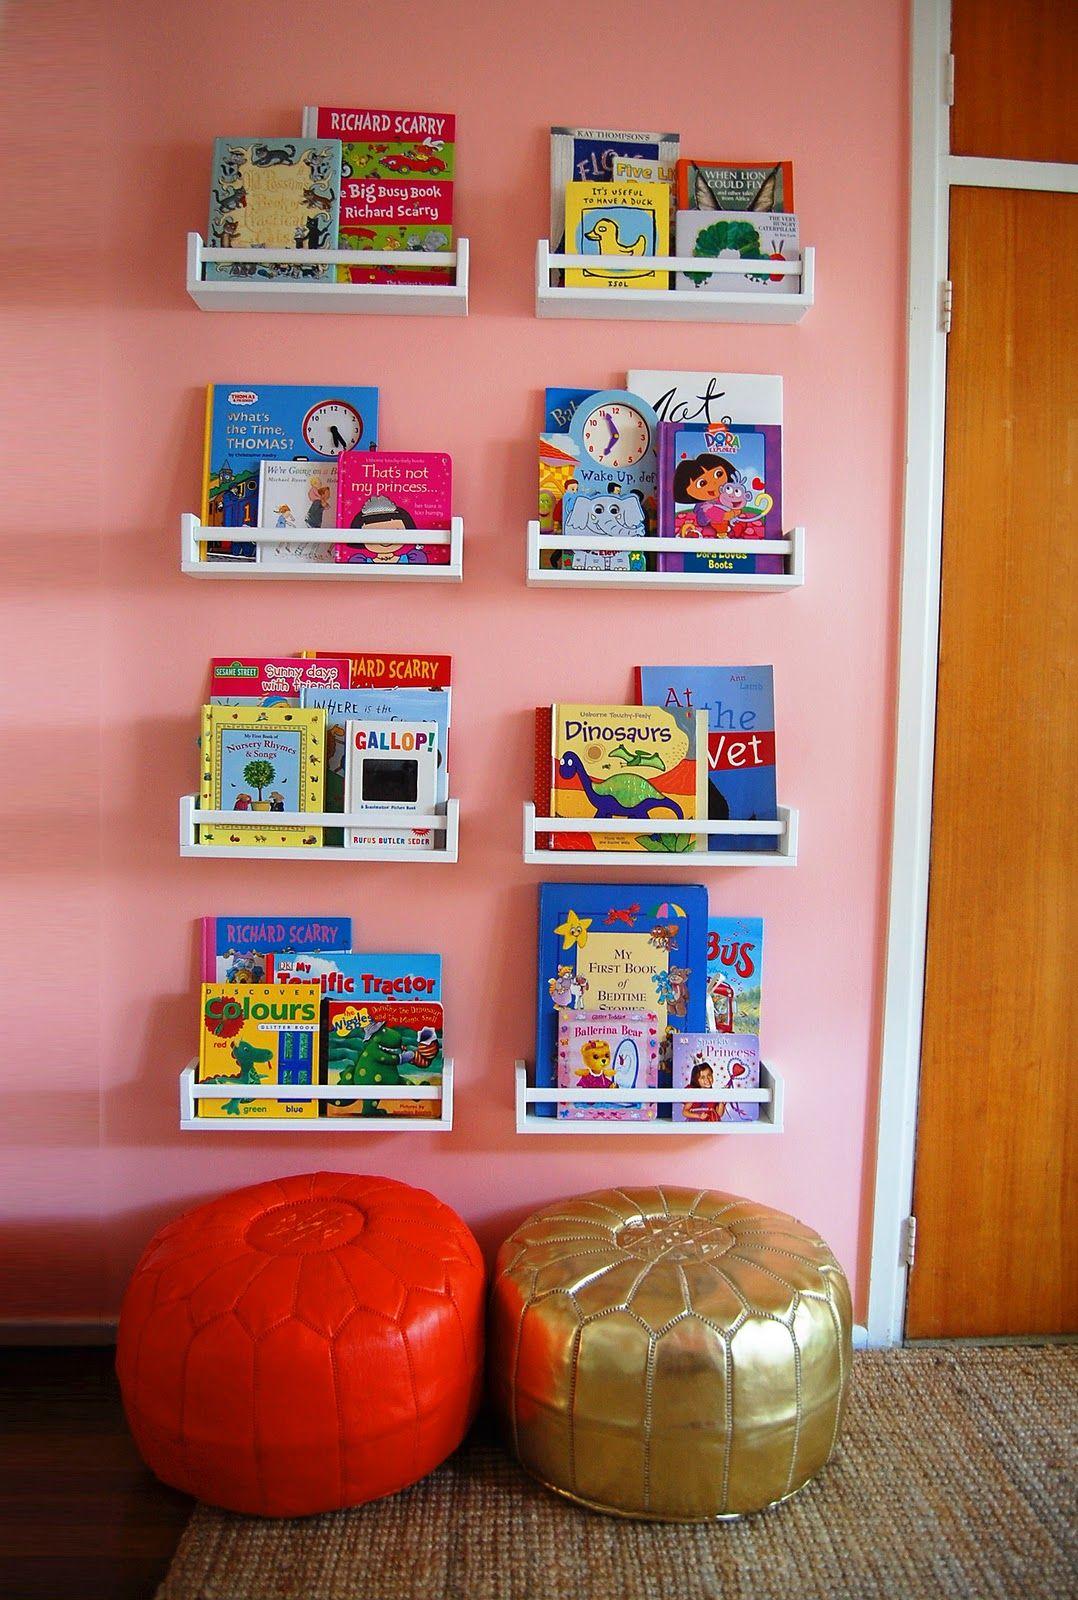 genius turn a 2 spice rack into book shelves favorite places rh pinterest com ikea spice cabinet ikea spice shelf books